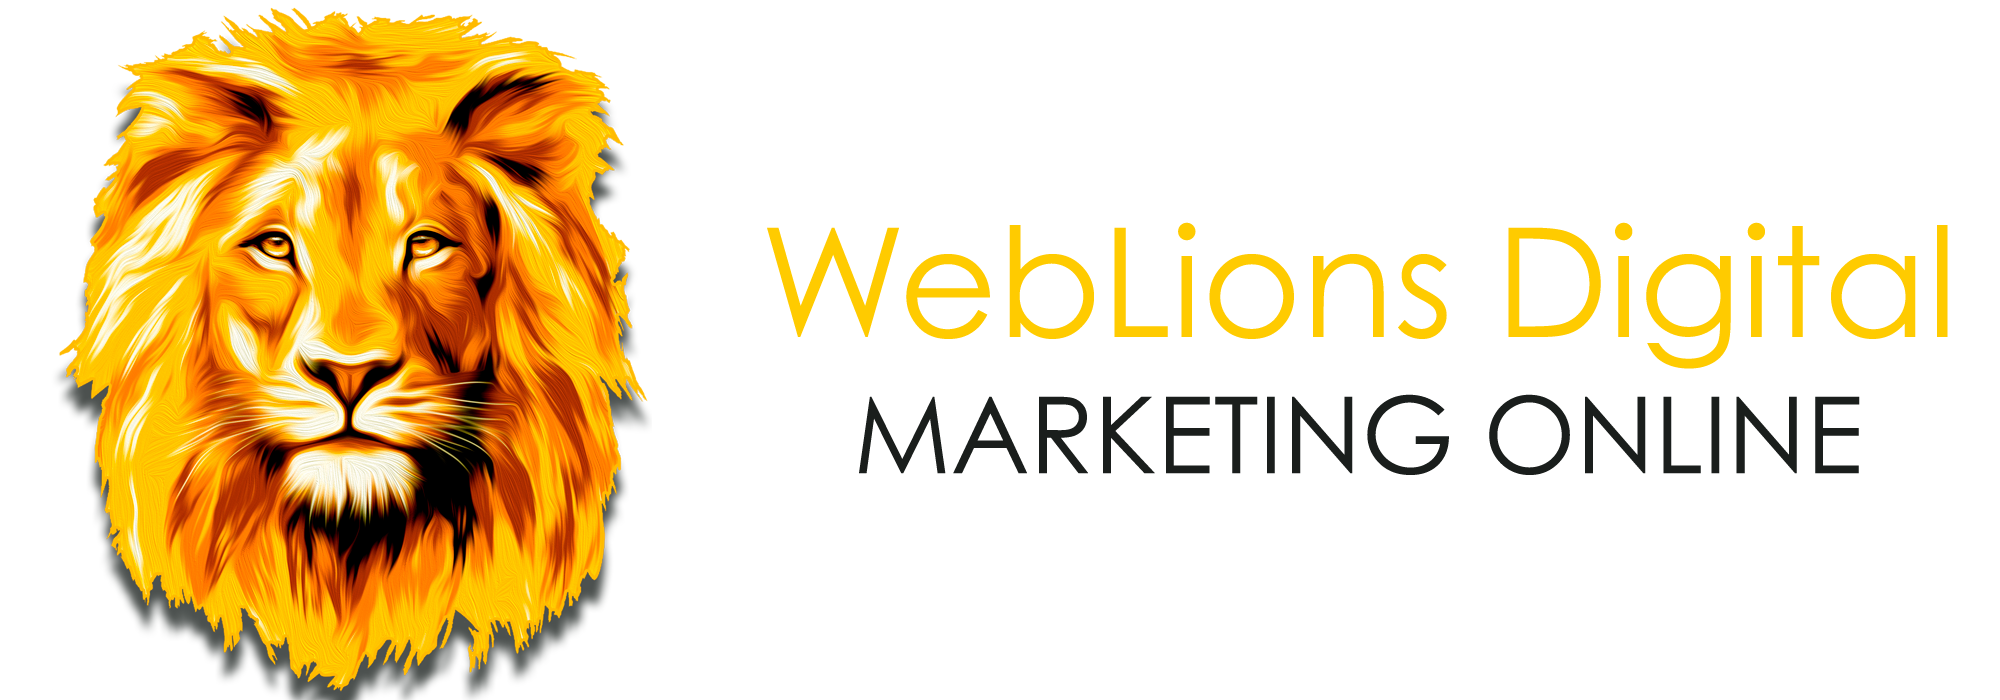 WebLions Digital